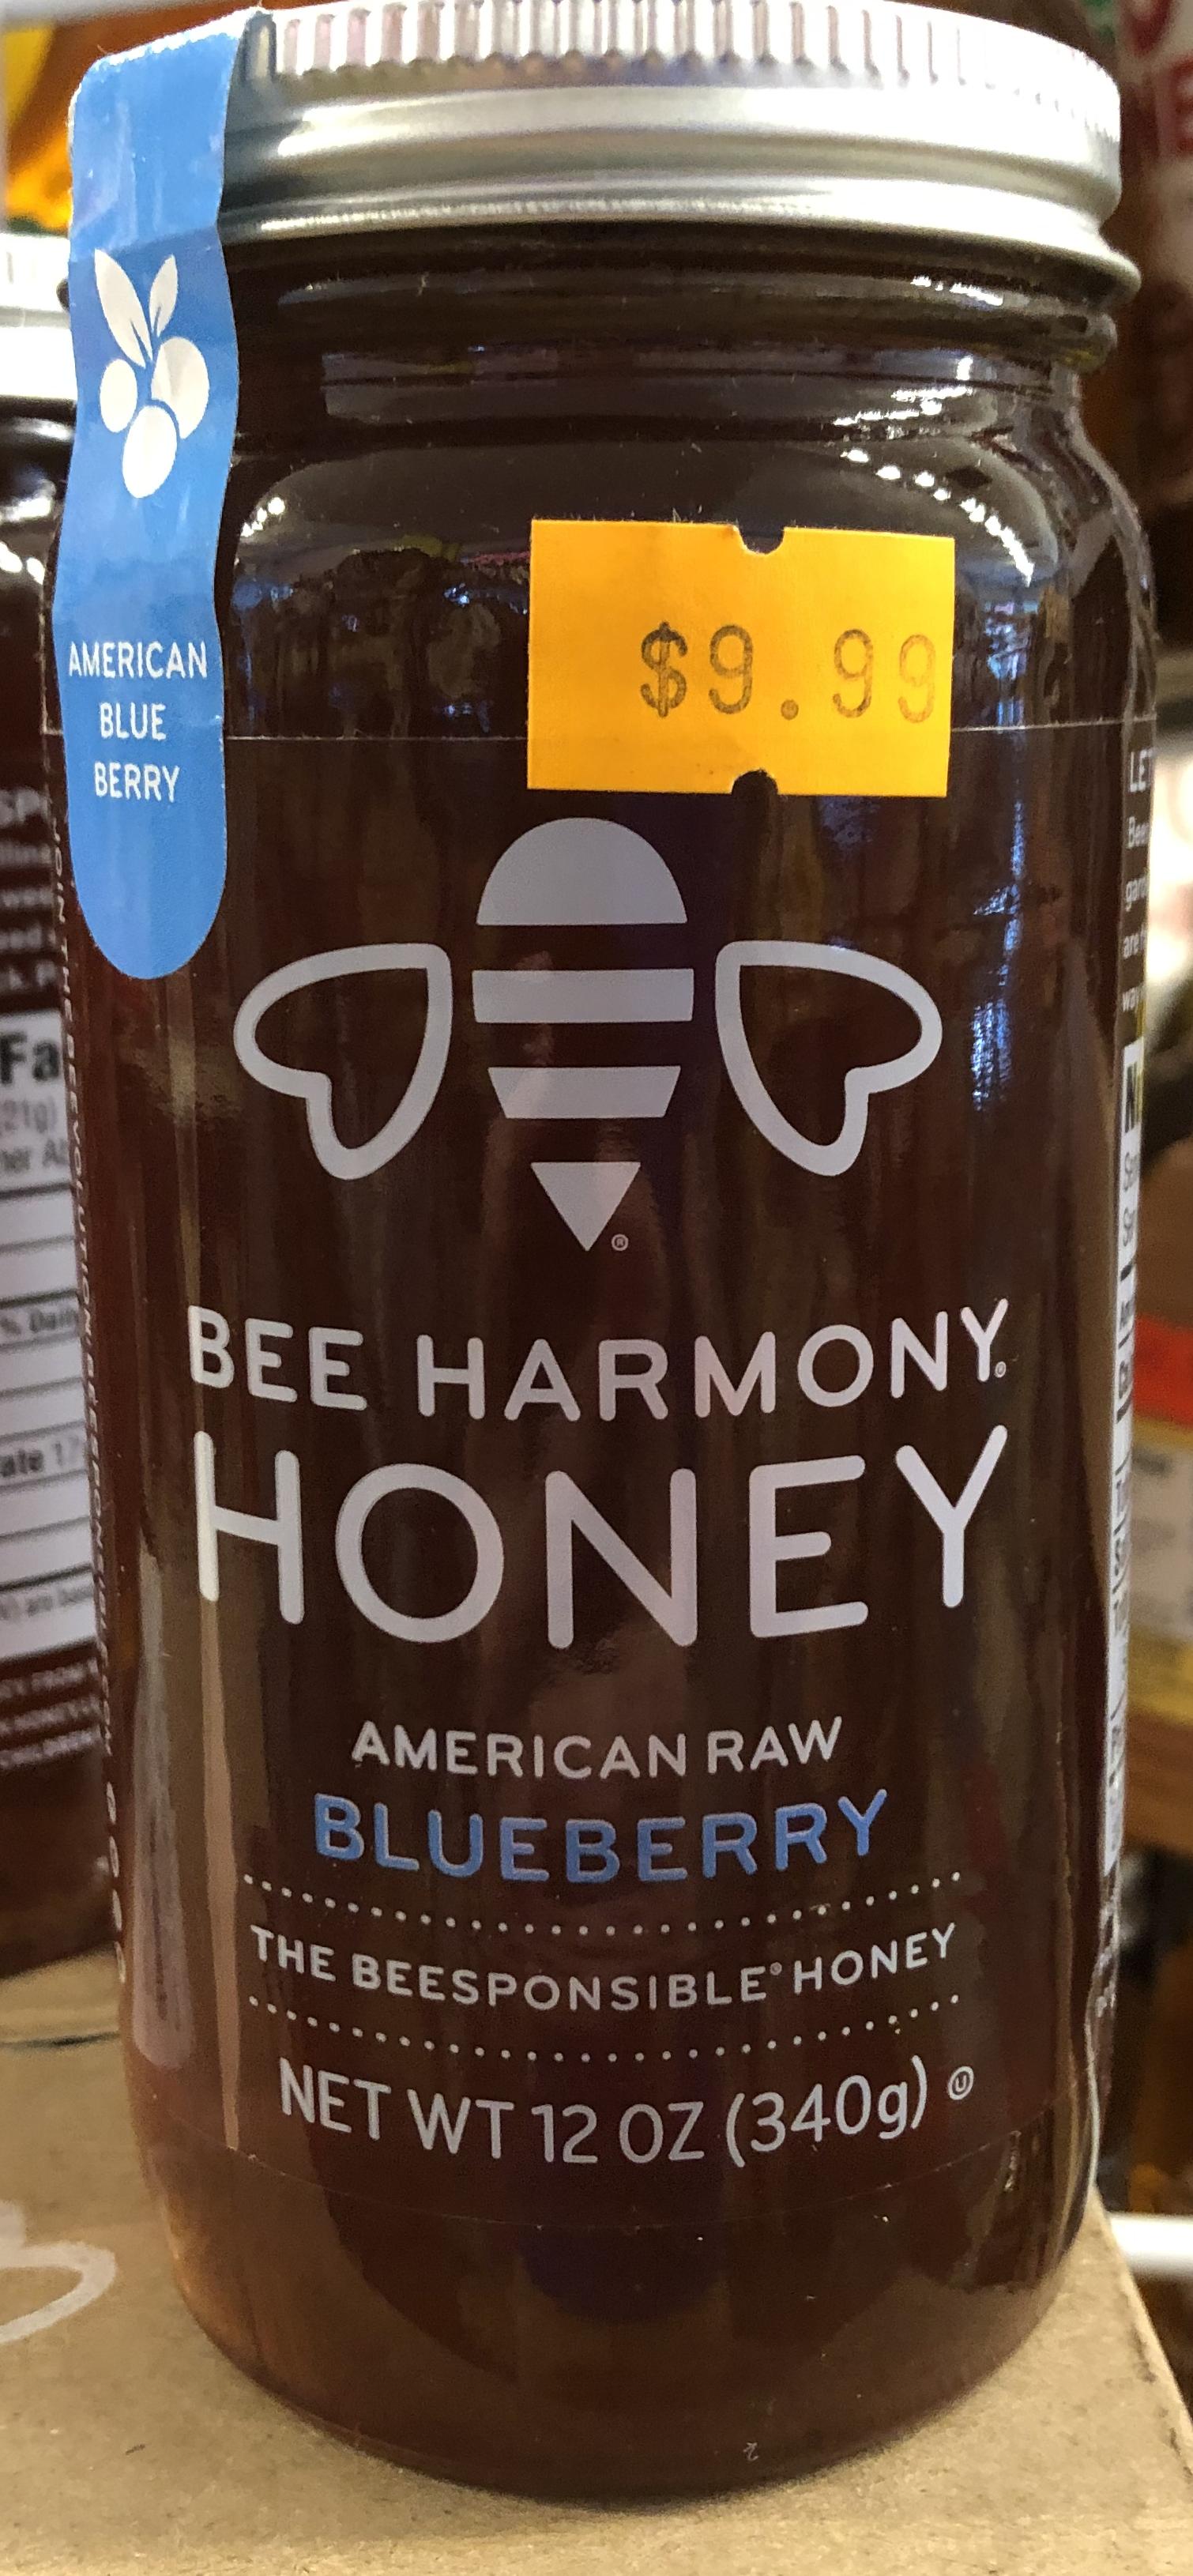 Bee Harmony Honey - American Raw Blueberry